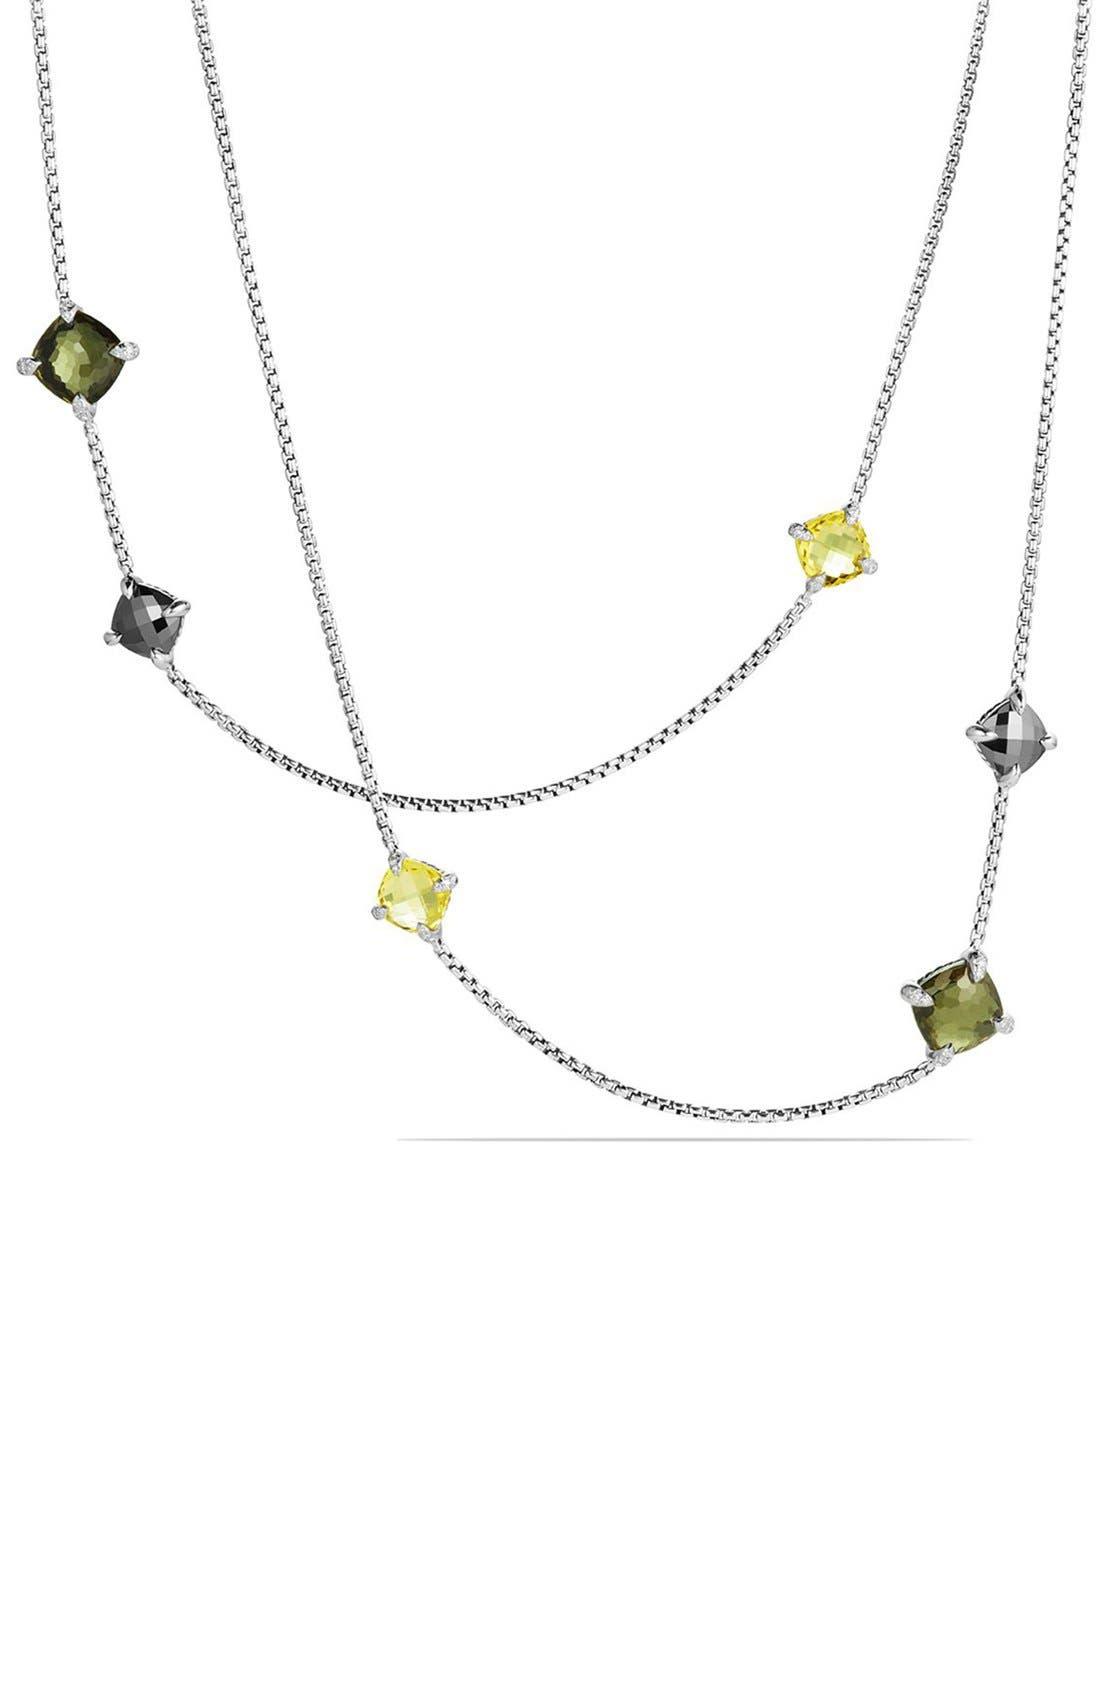 Main Image - David Yurman 'Châ telaine' Long Station Necklace with Diamonds